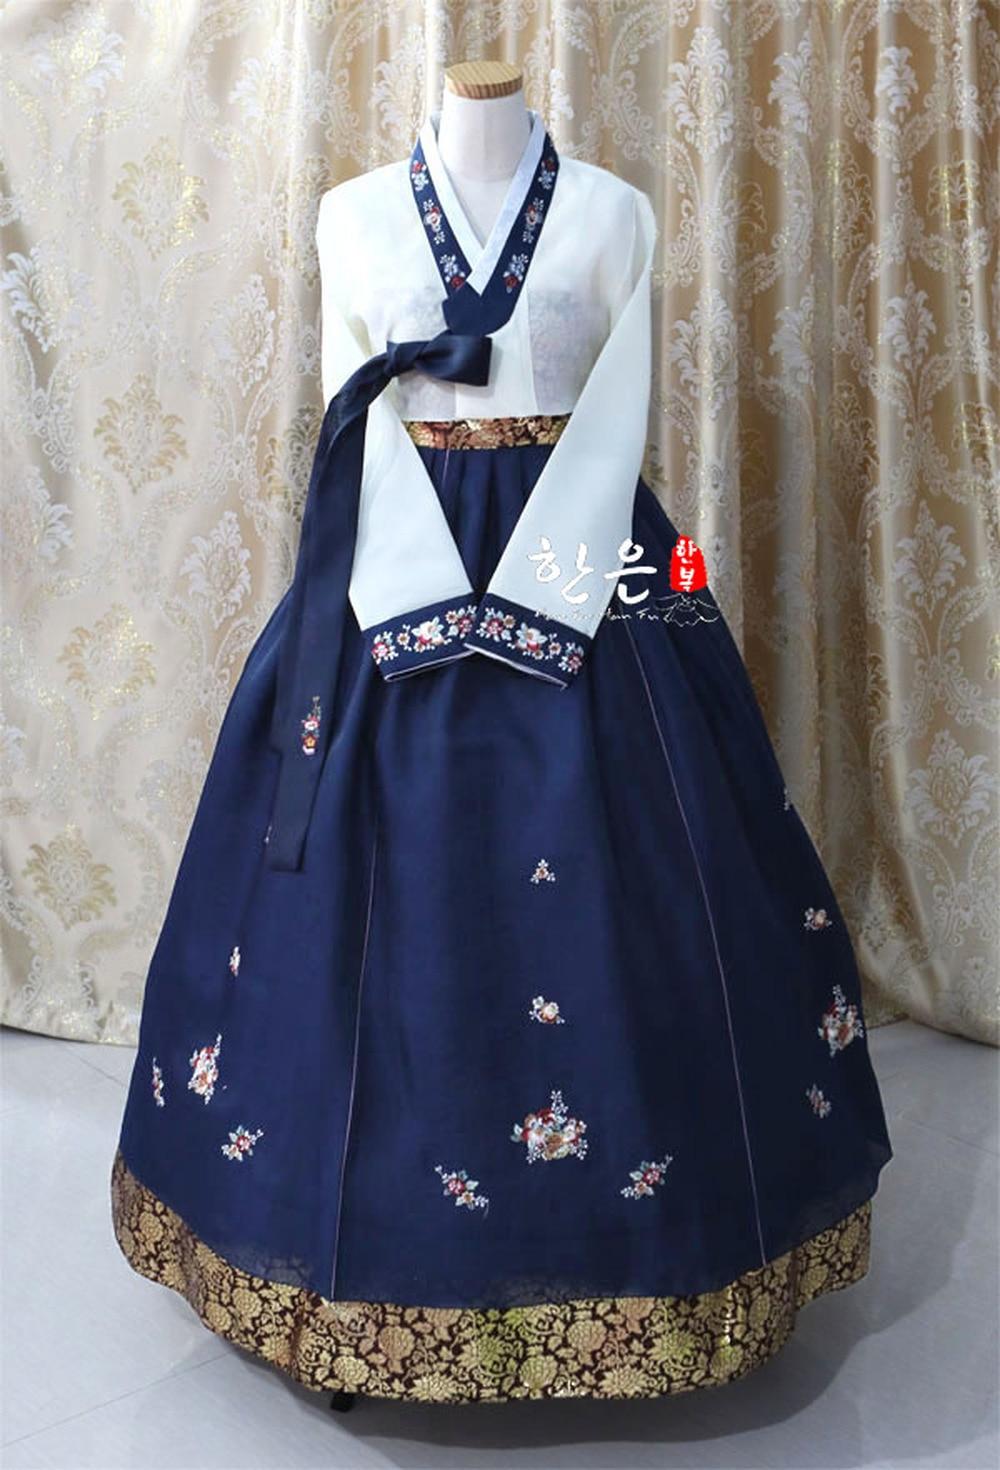 فستان حريمي كوري من الهانبوك فستان رقص عرقي تقليدي كم طويل تأثيري شحن مجاني مطرز